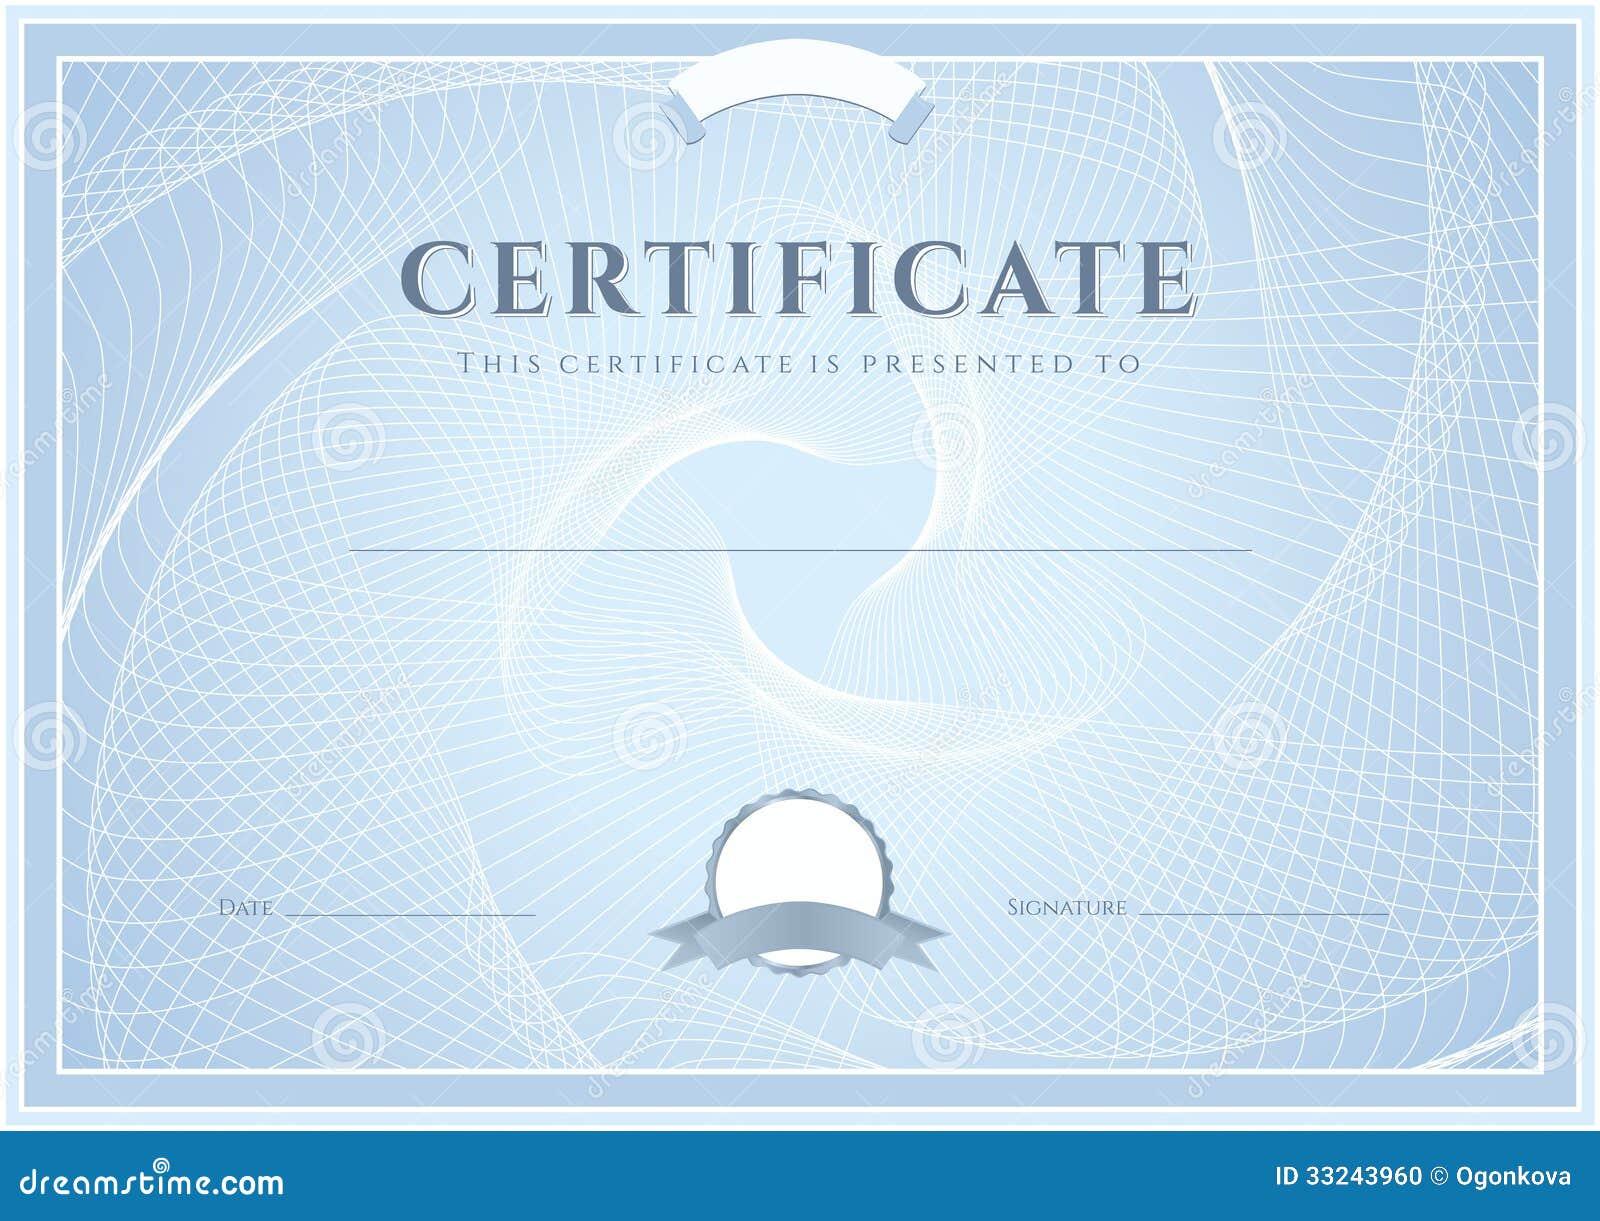 Zertifikat, Diplomschablone. Preismuster Vektor Abbildung ...